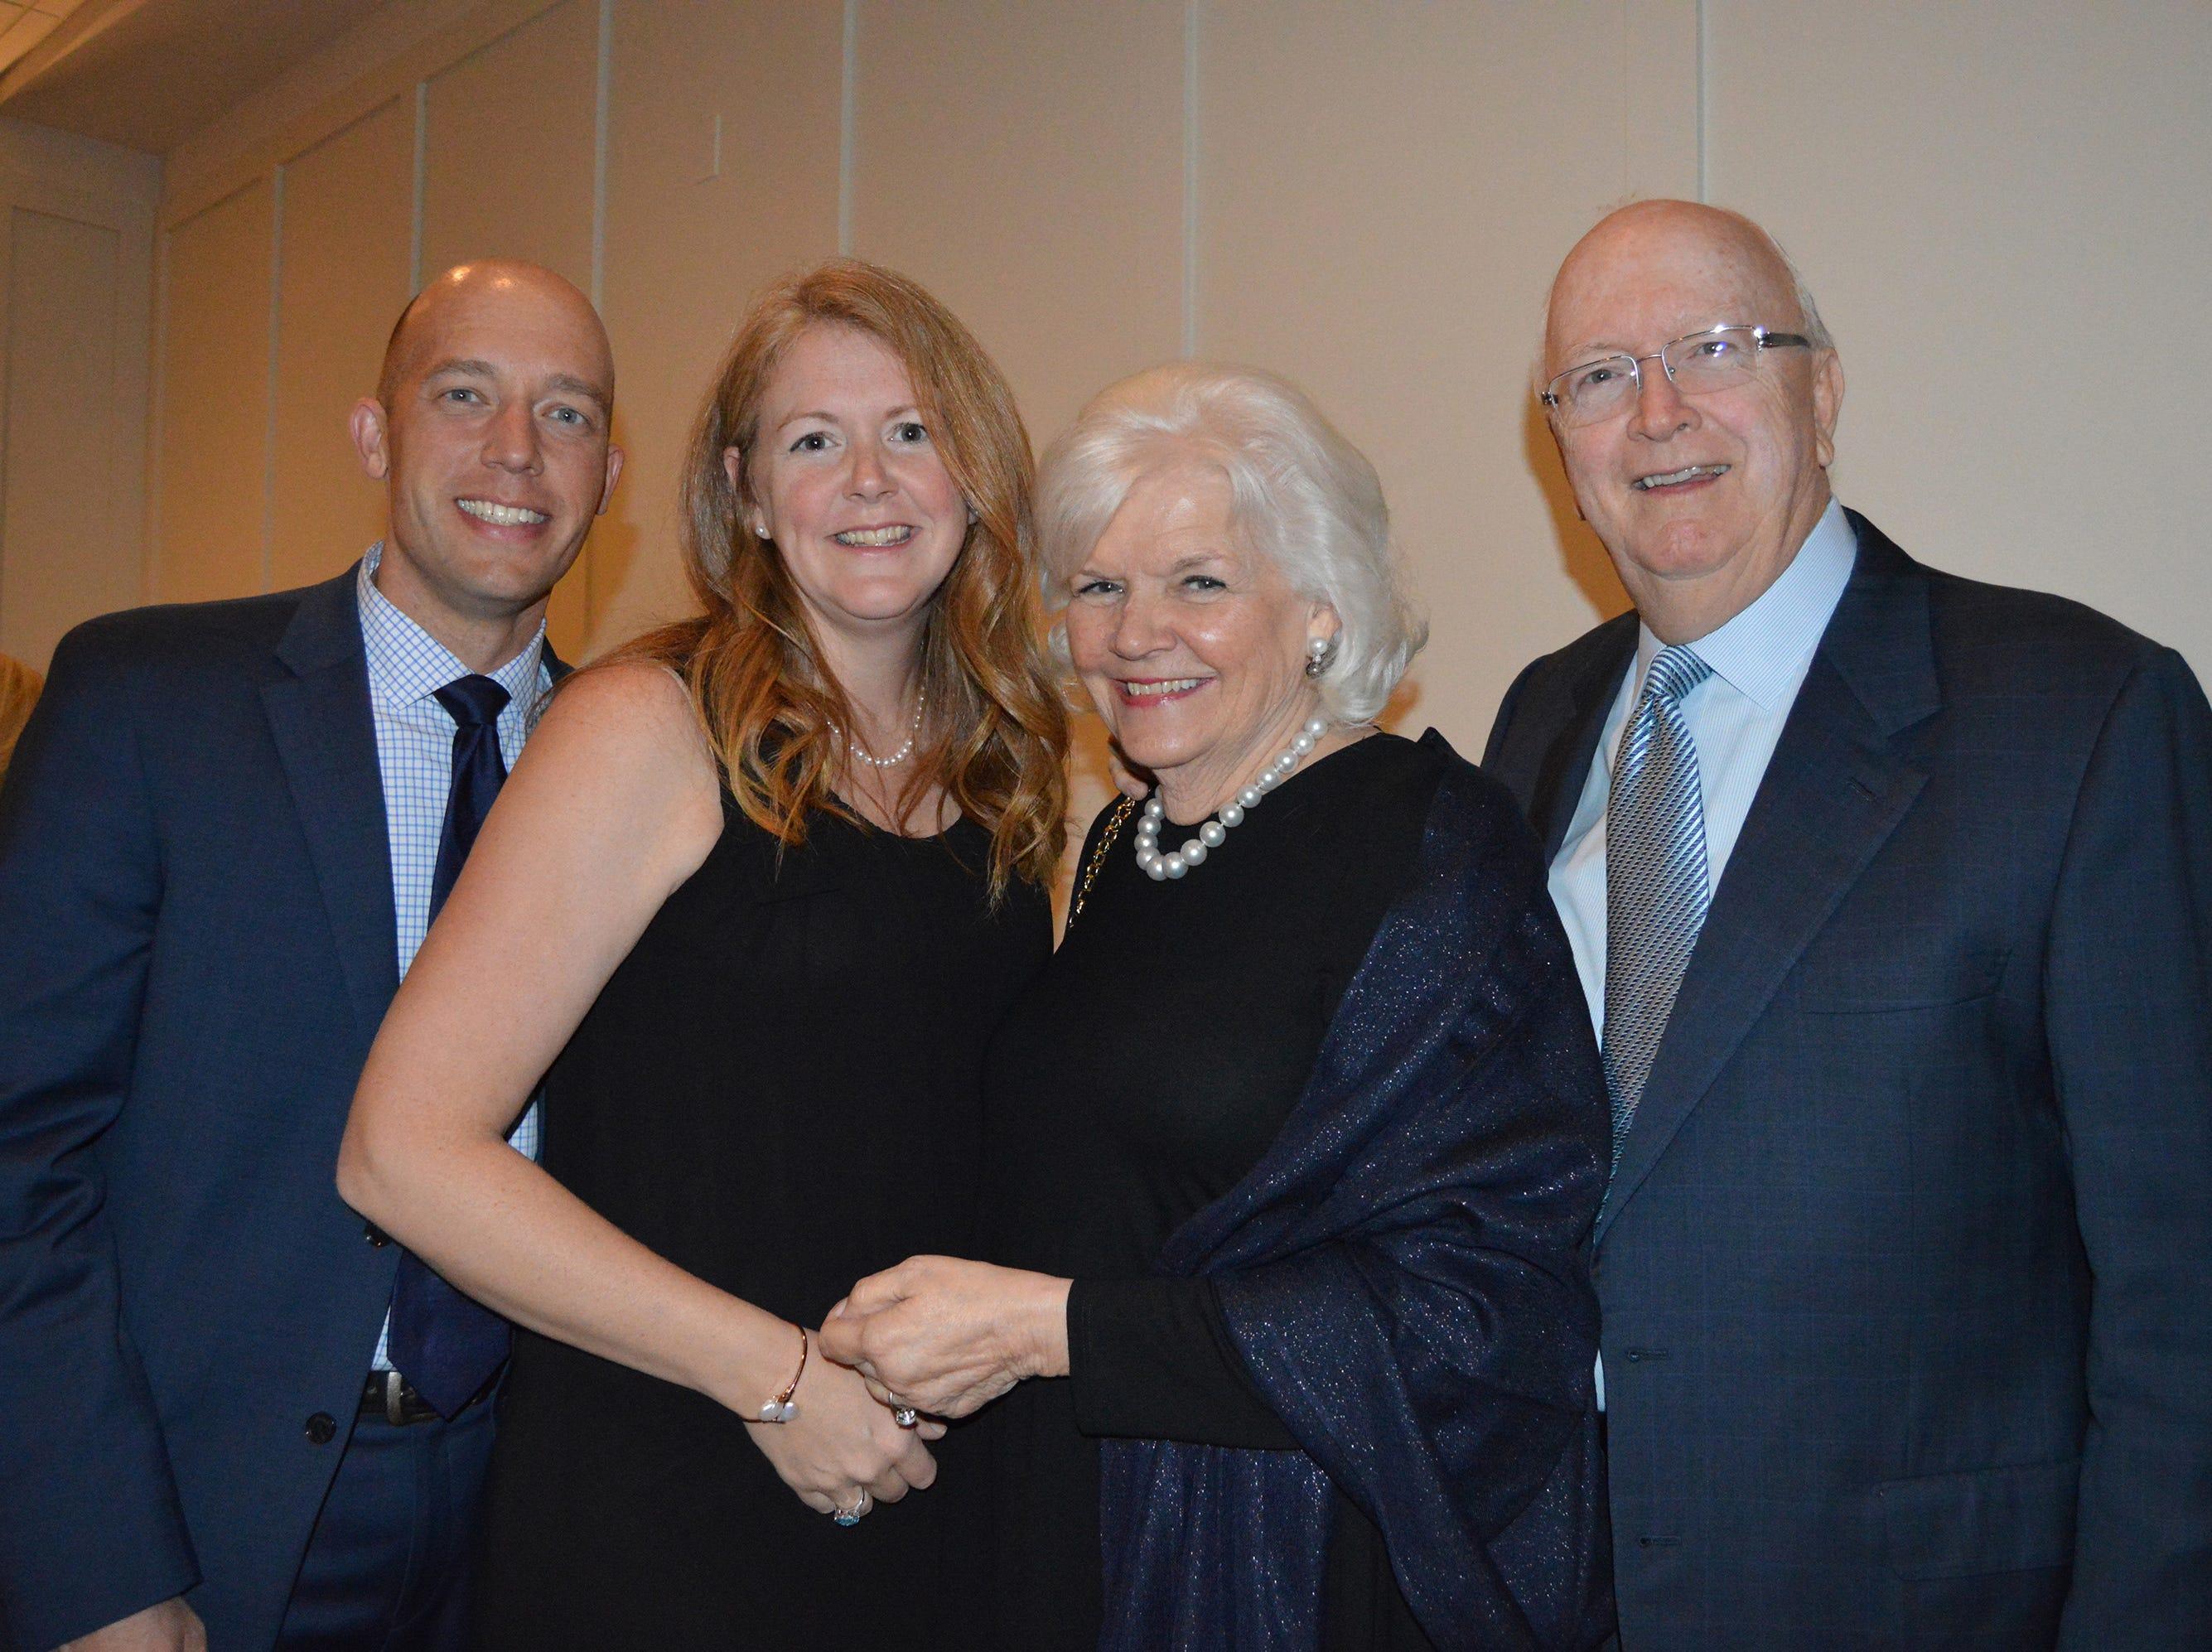 Adam and Sarah Logemann, left, with Linda and Gordon Stewart at the Diamonds in the Rough Gala at Grand Harbor Golf & Beach Club on Jan.24.